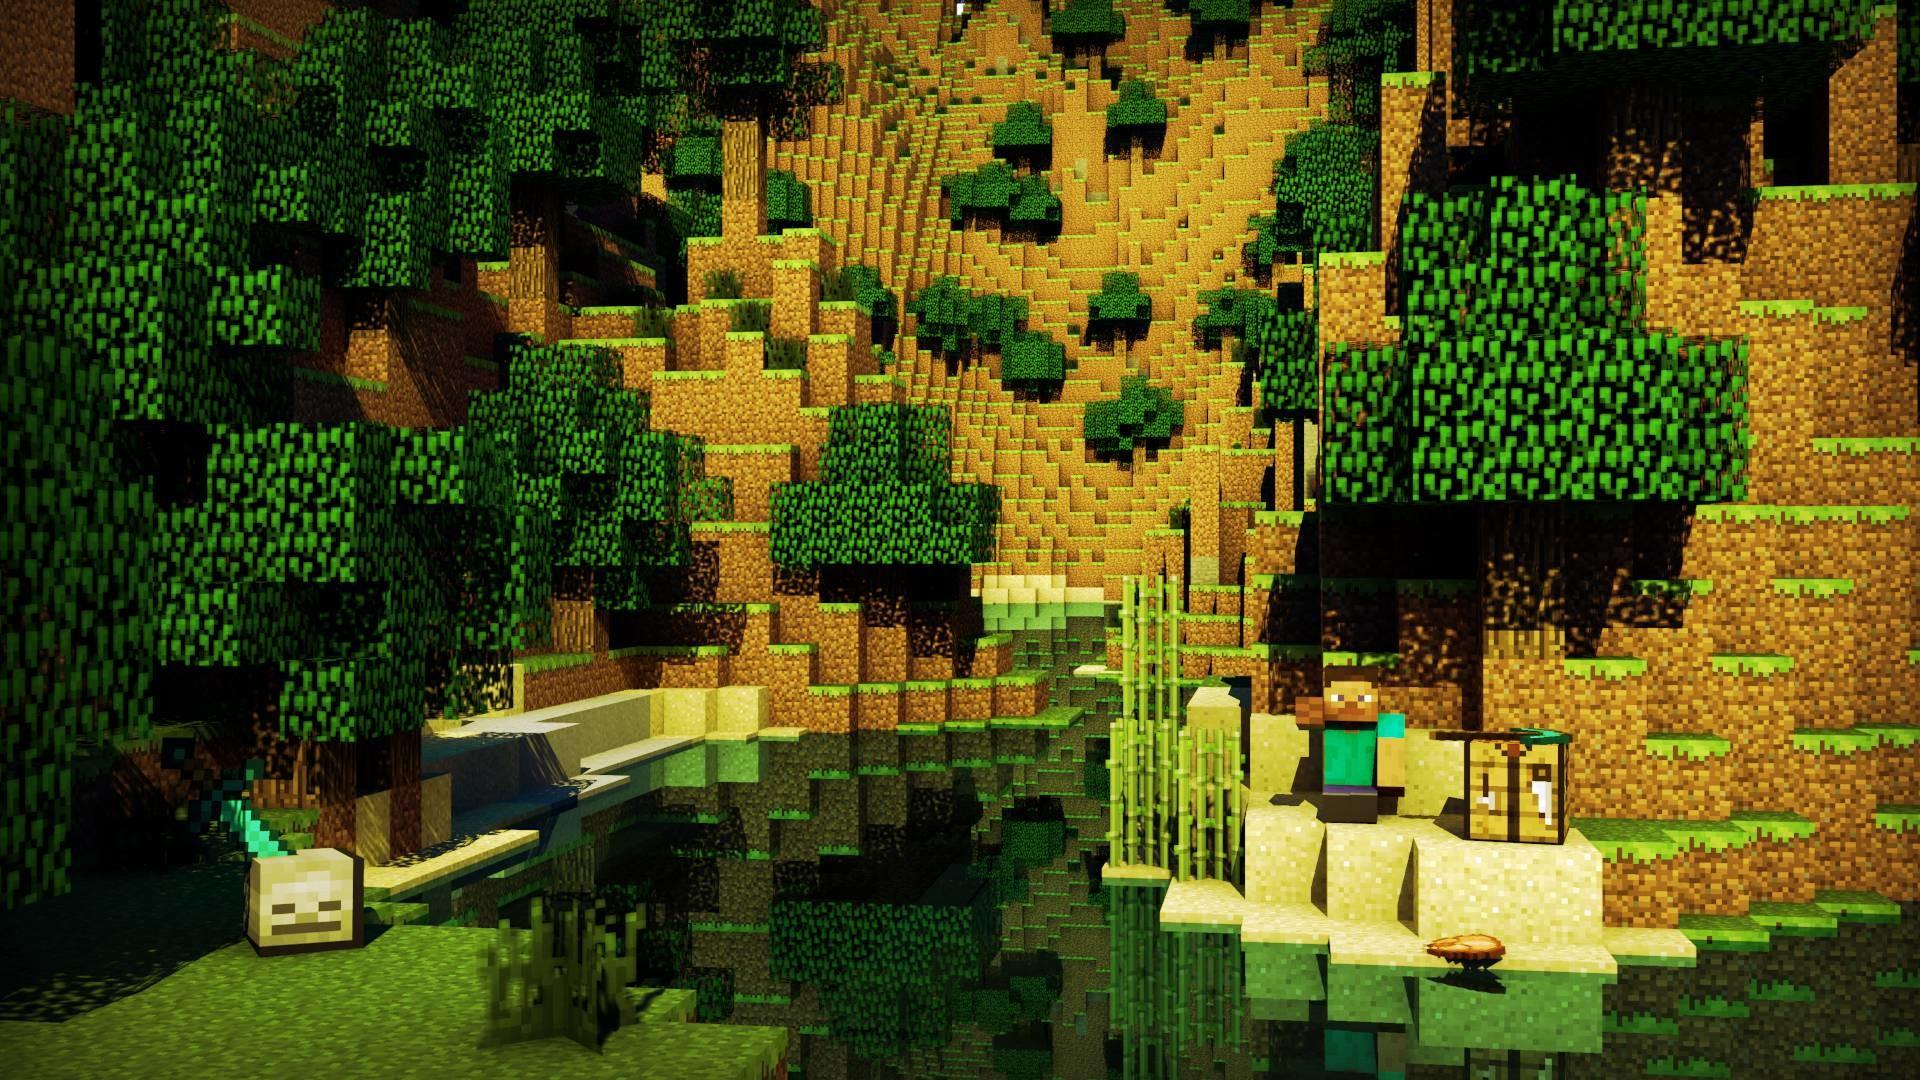 Full HD p Minecraft Wallpapers HD, Desktop Backgrounds Images Minecraft Wallpapers  Wallpapers)